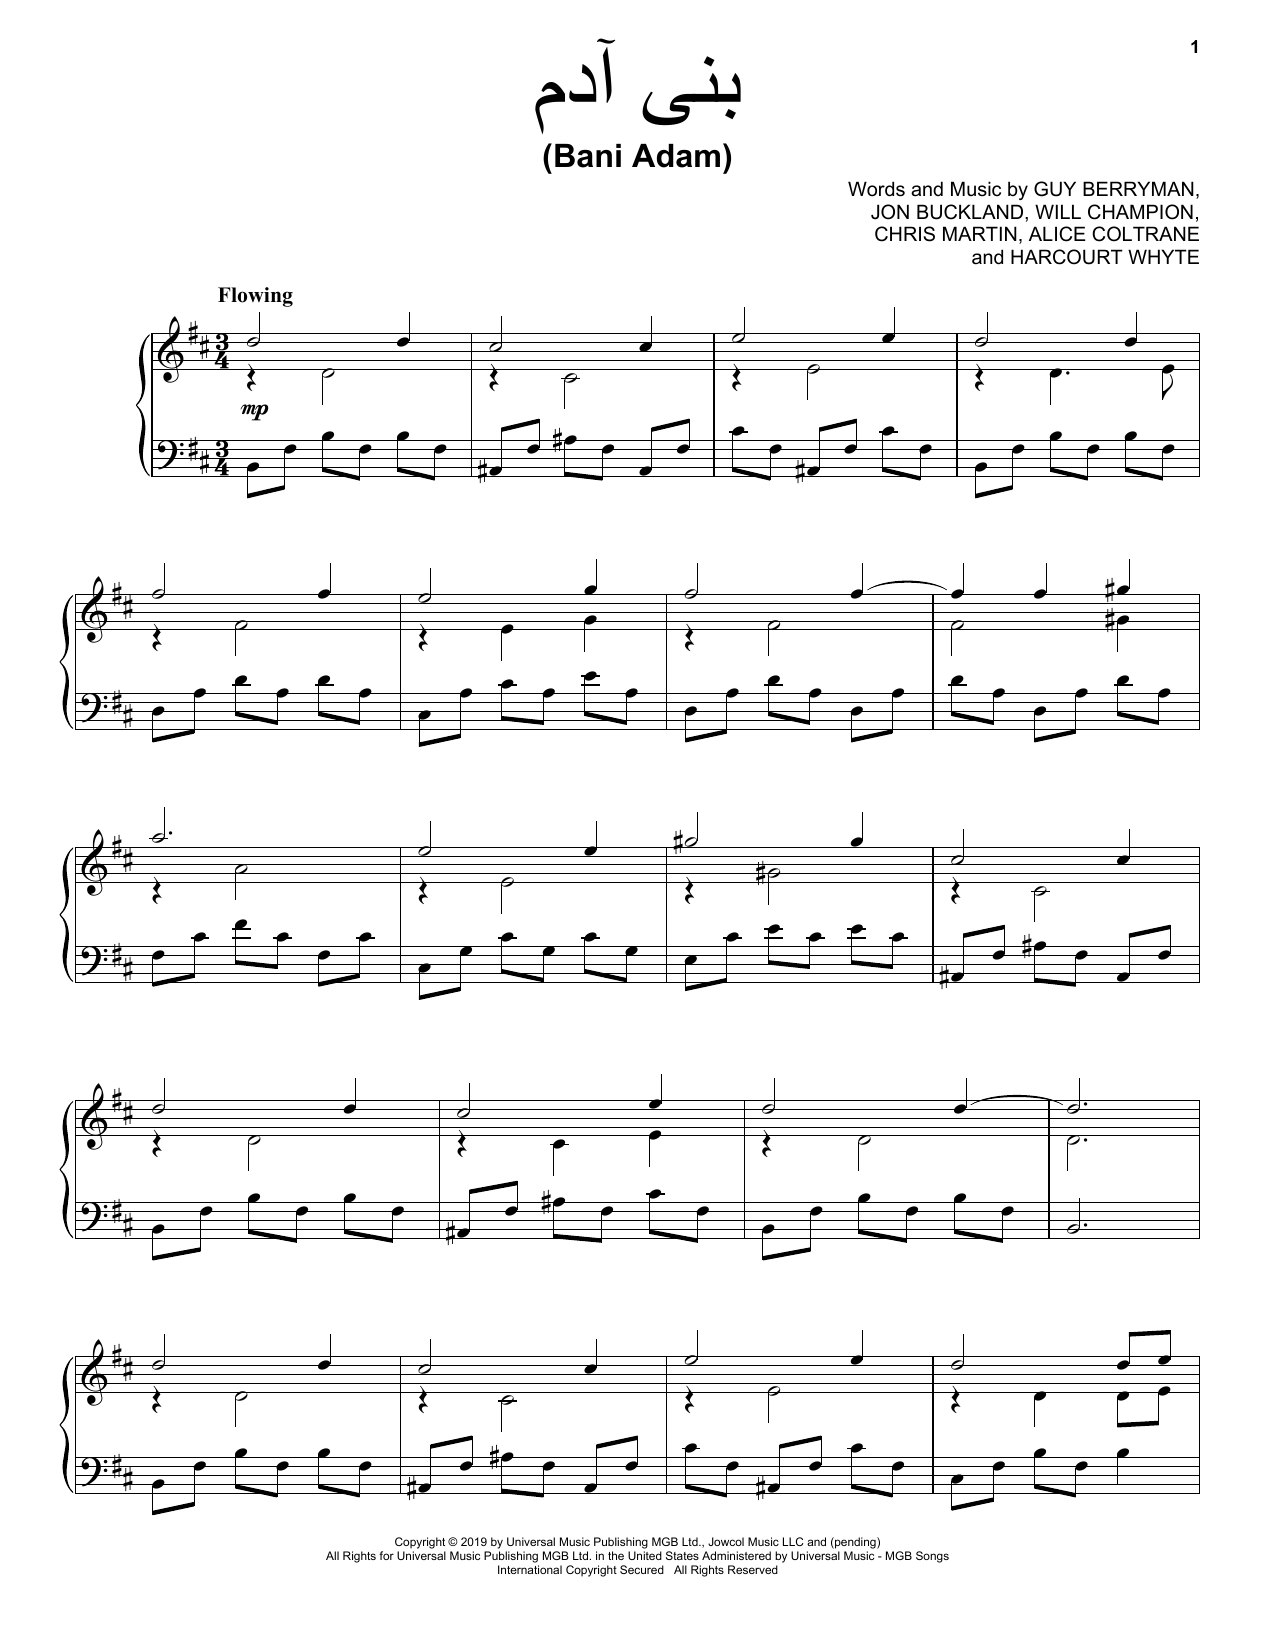 Coldplay Bani Adam sheet music notes and chords